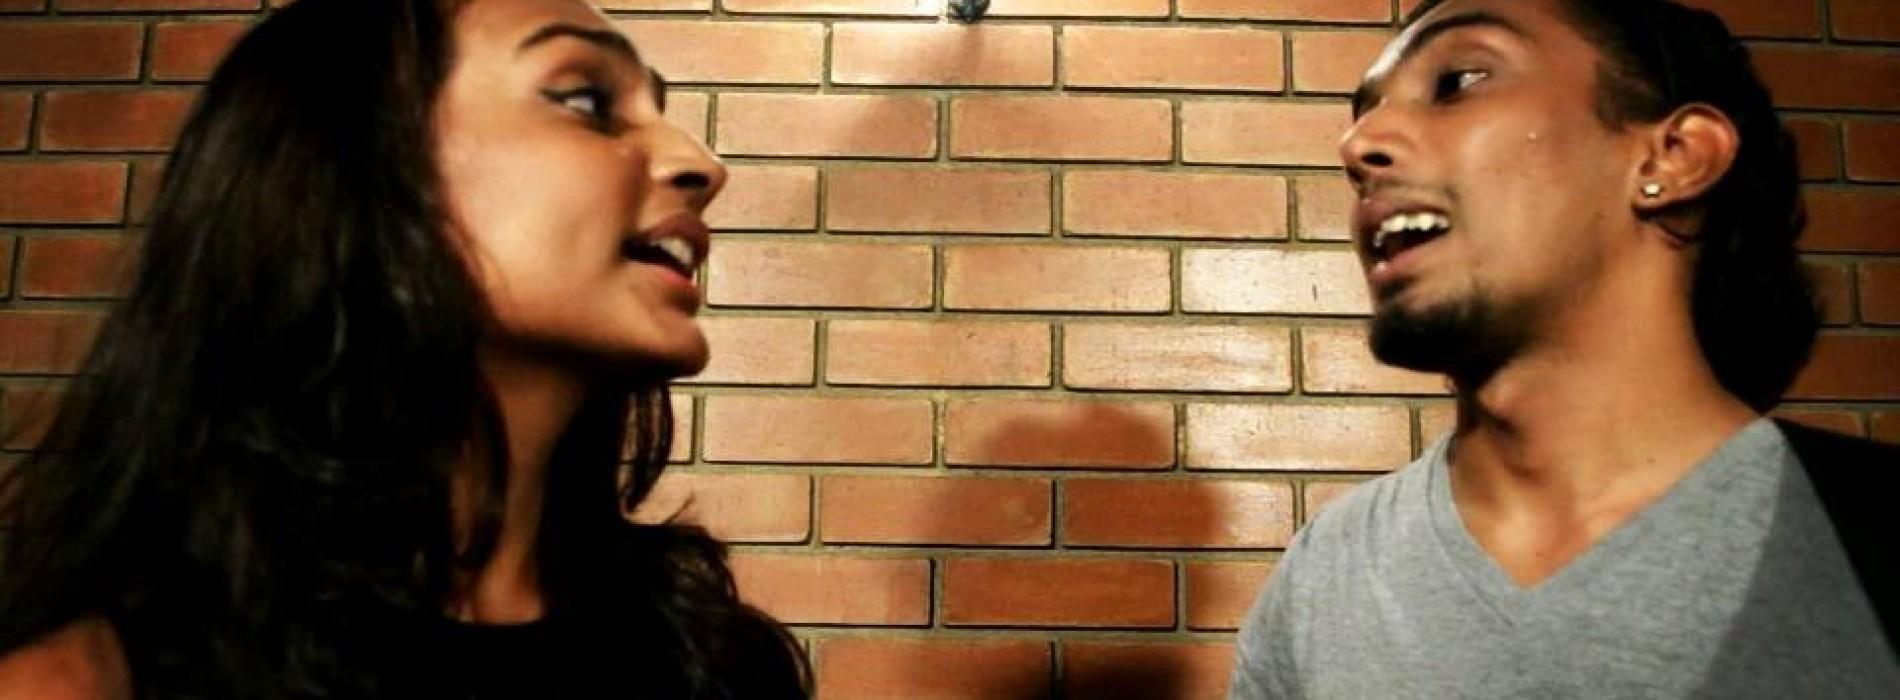 Ryan & Senani – Four Five Seconds (Acoustic Cover)